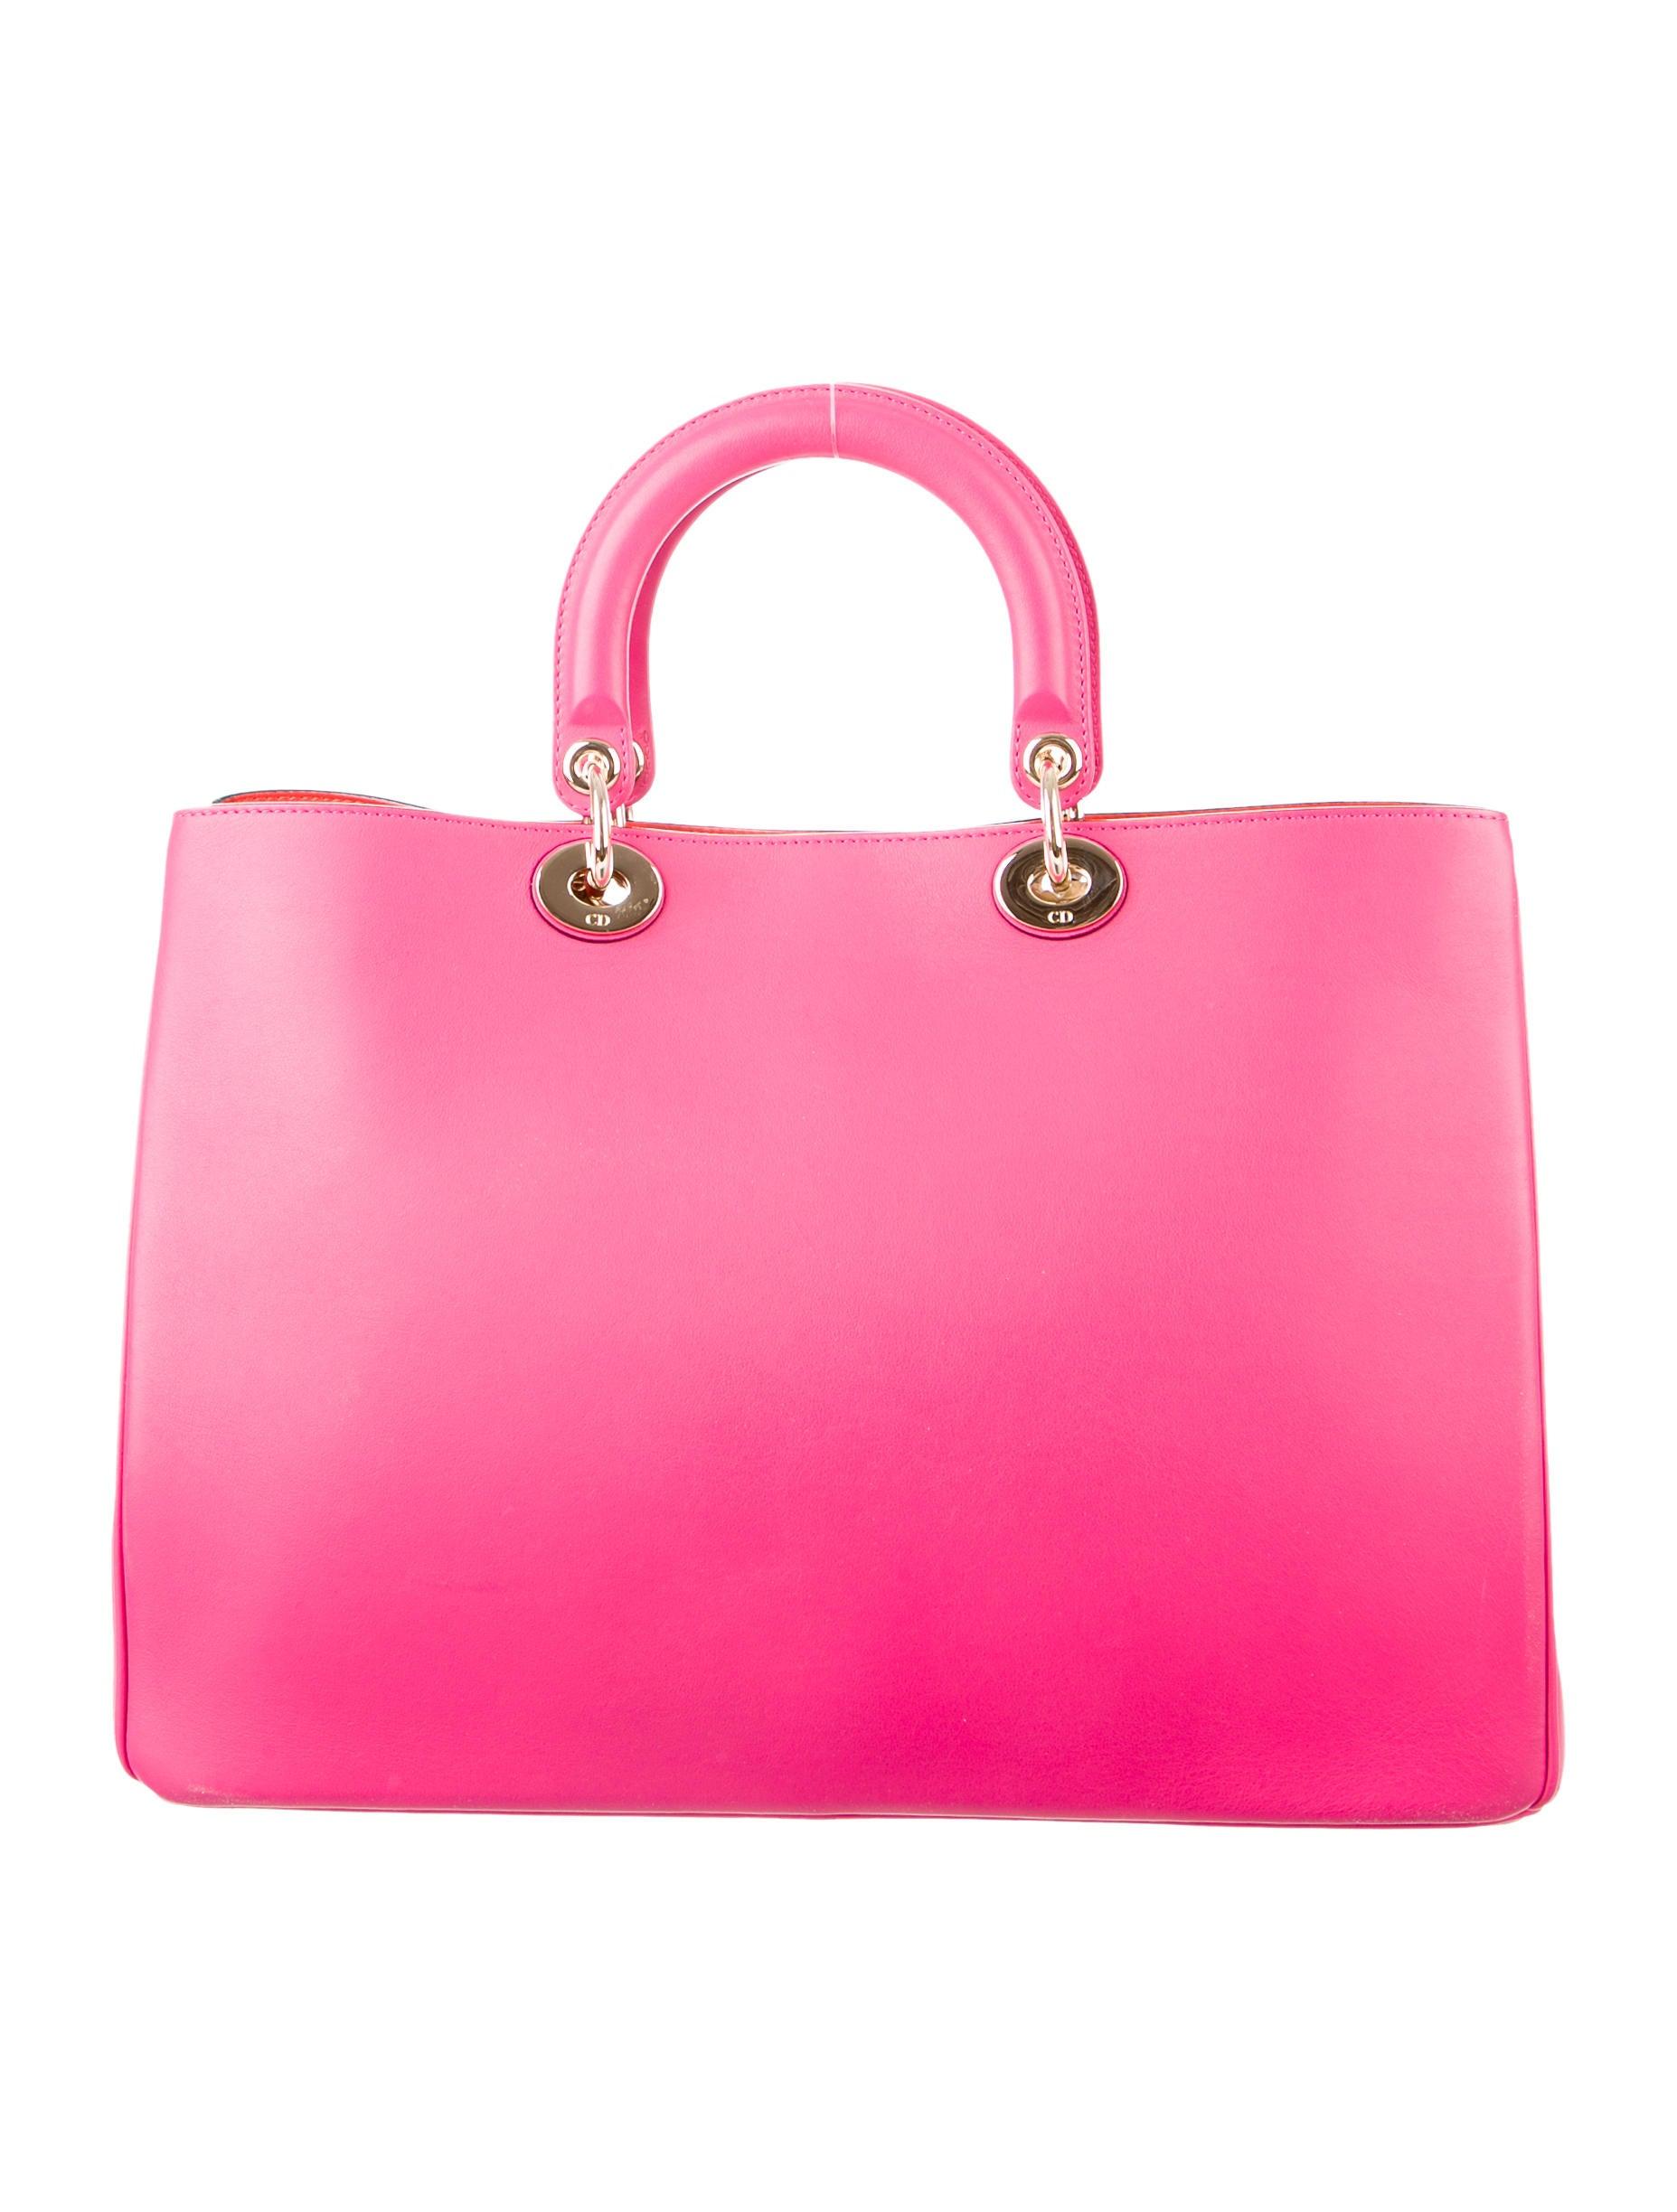 Creative Christian Dior Large Lady Dior Bag  Handbags  CHR34071  The